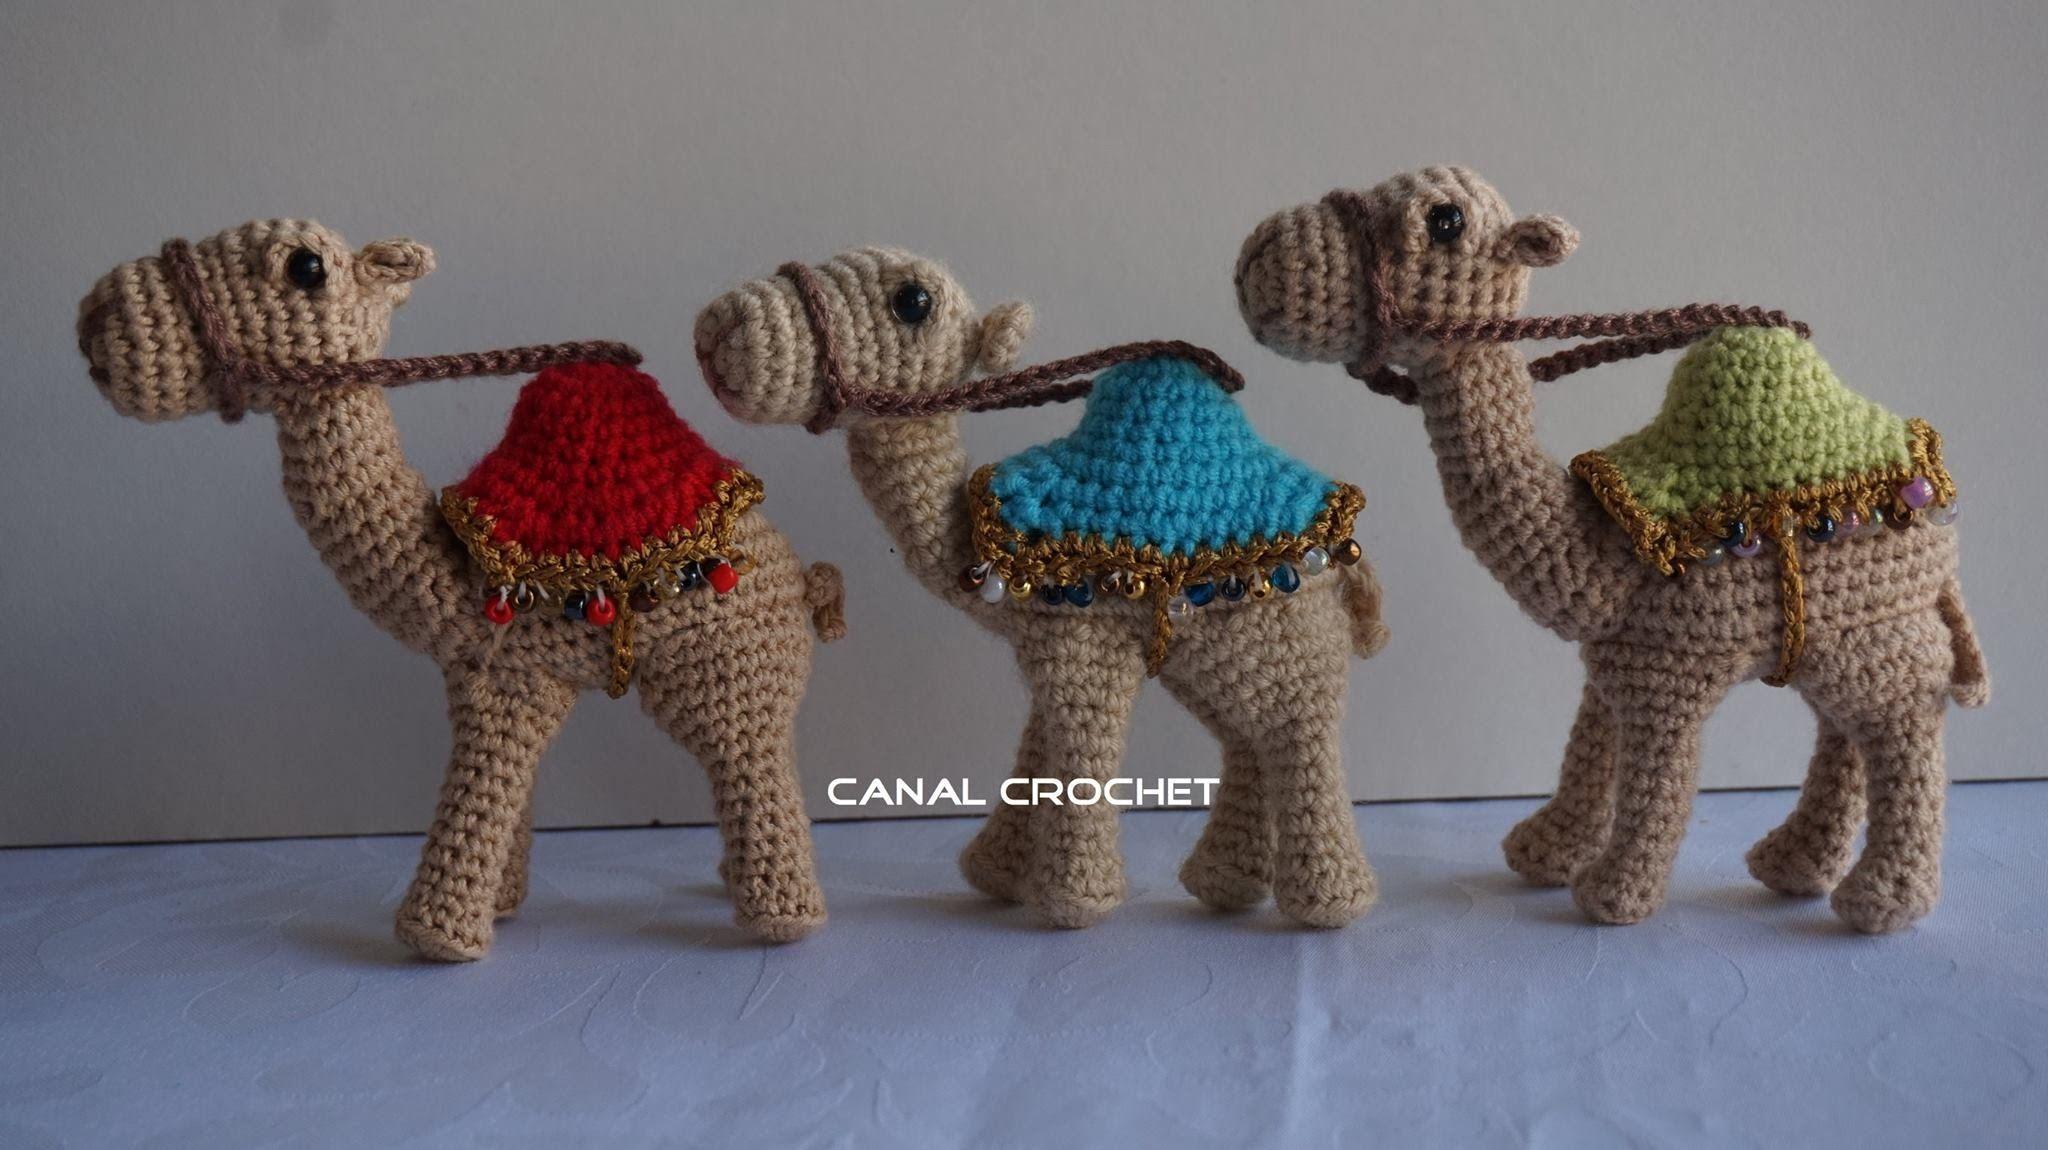 Tejiendoperu Crochet Amigurumis : Amigurumi tejiendo peru oso panda kawaii tejido a crochet